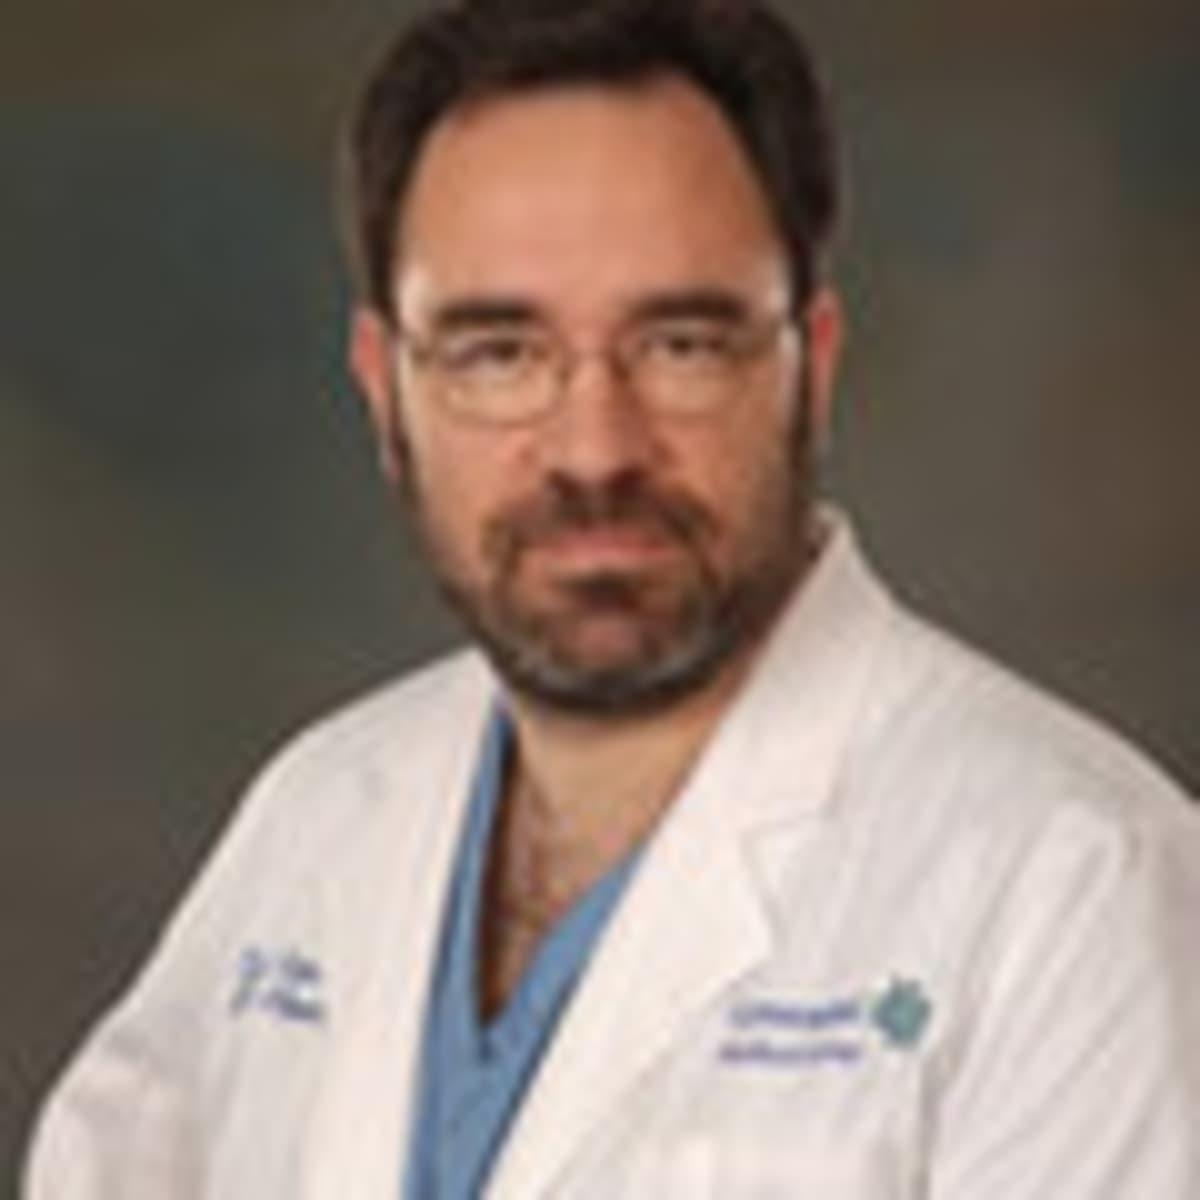 dr david blann md lubbock tx obstetrician gynecologist